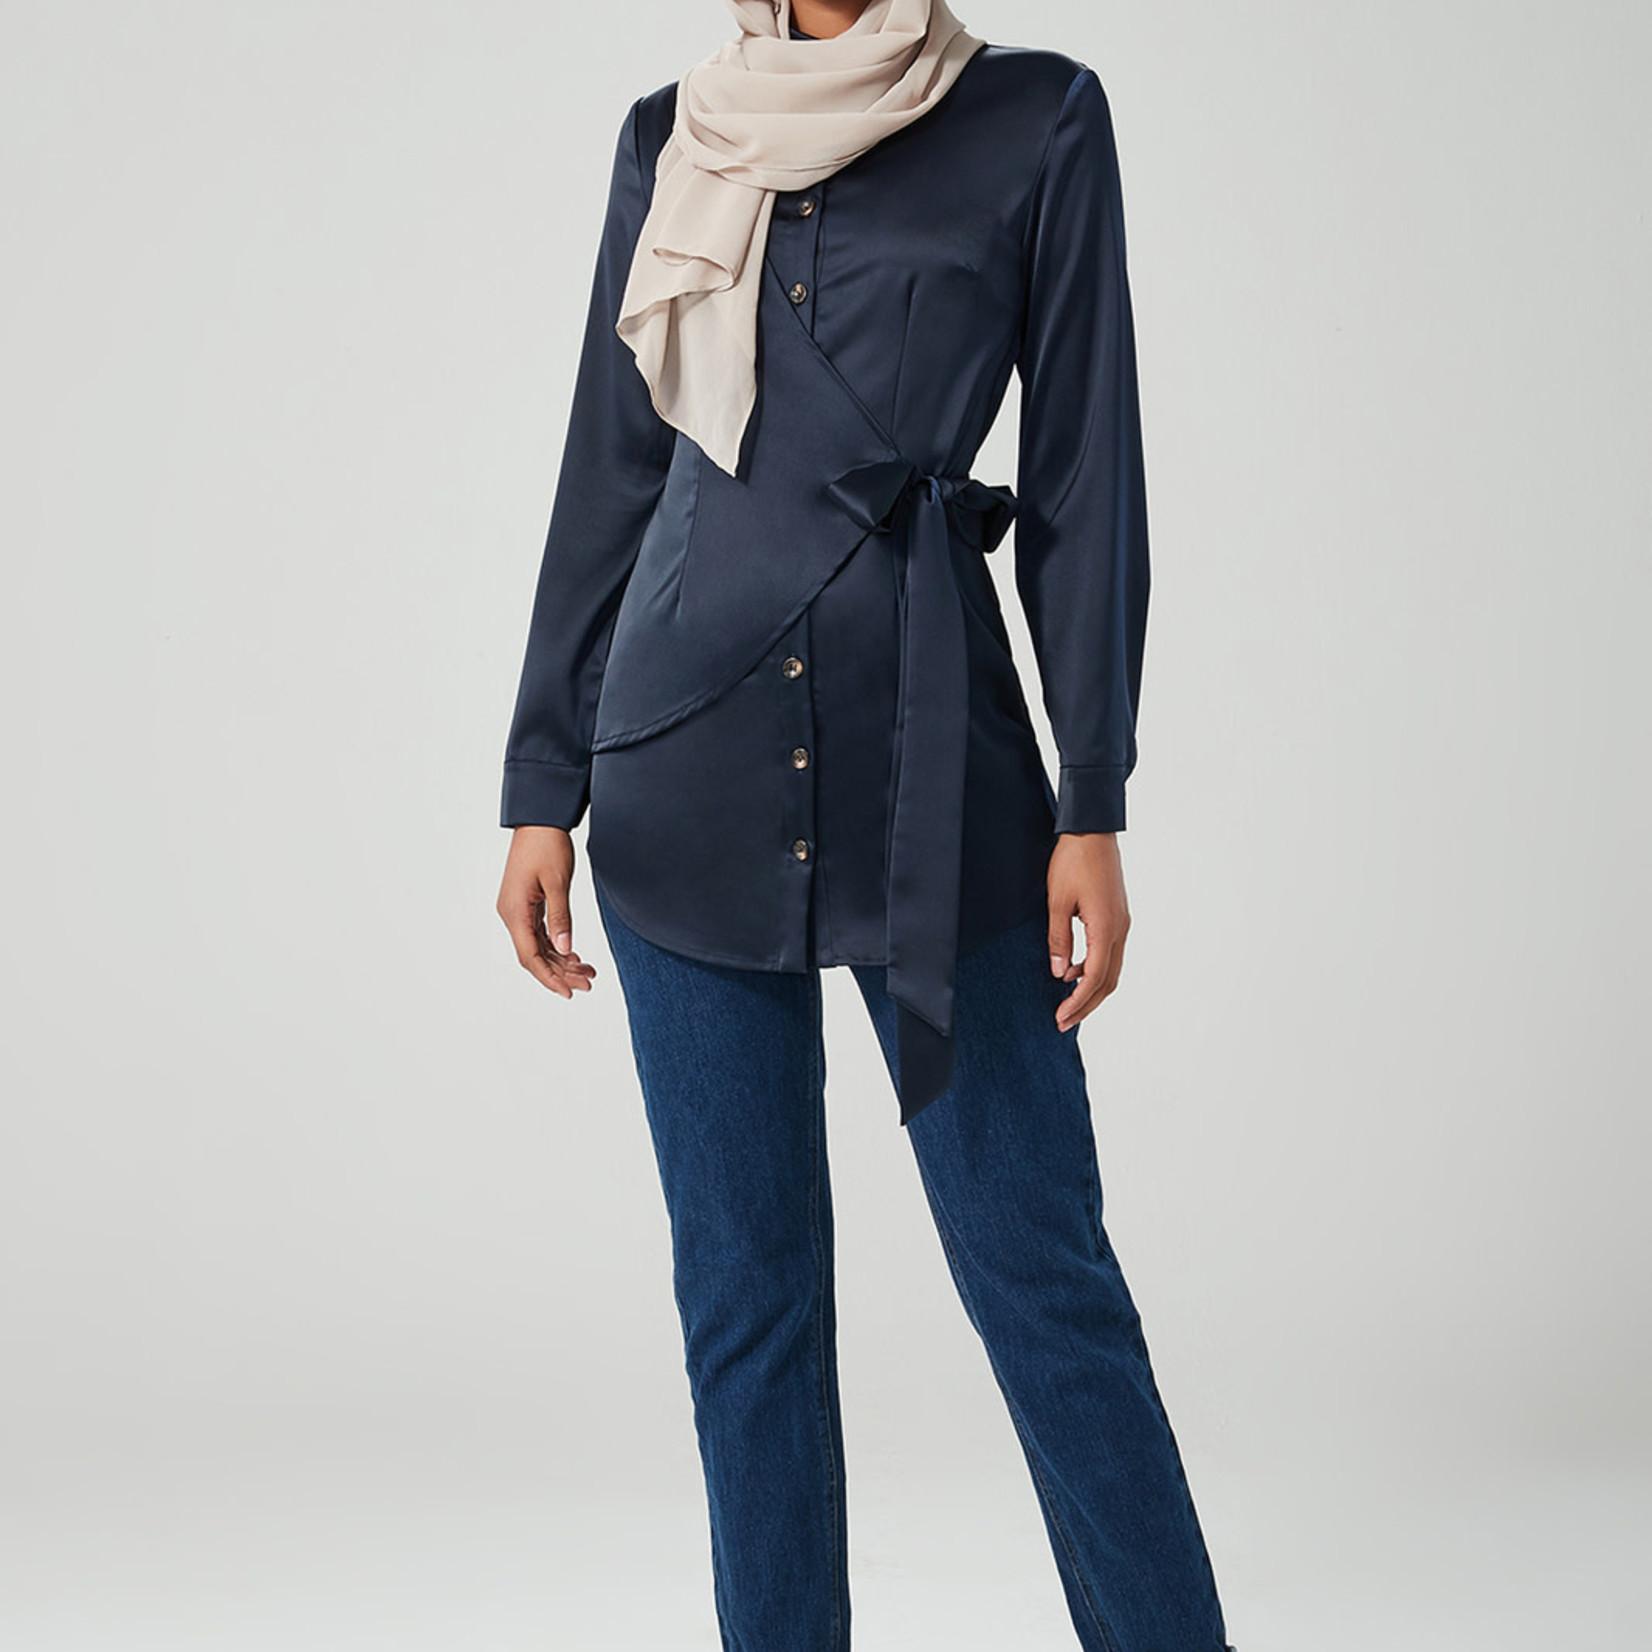 Hijab House Button Wrap Tie Shirt